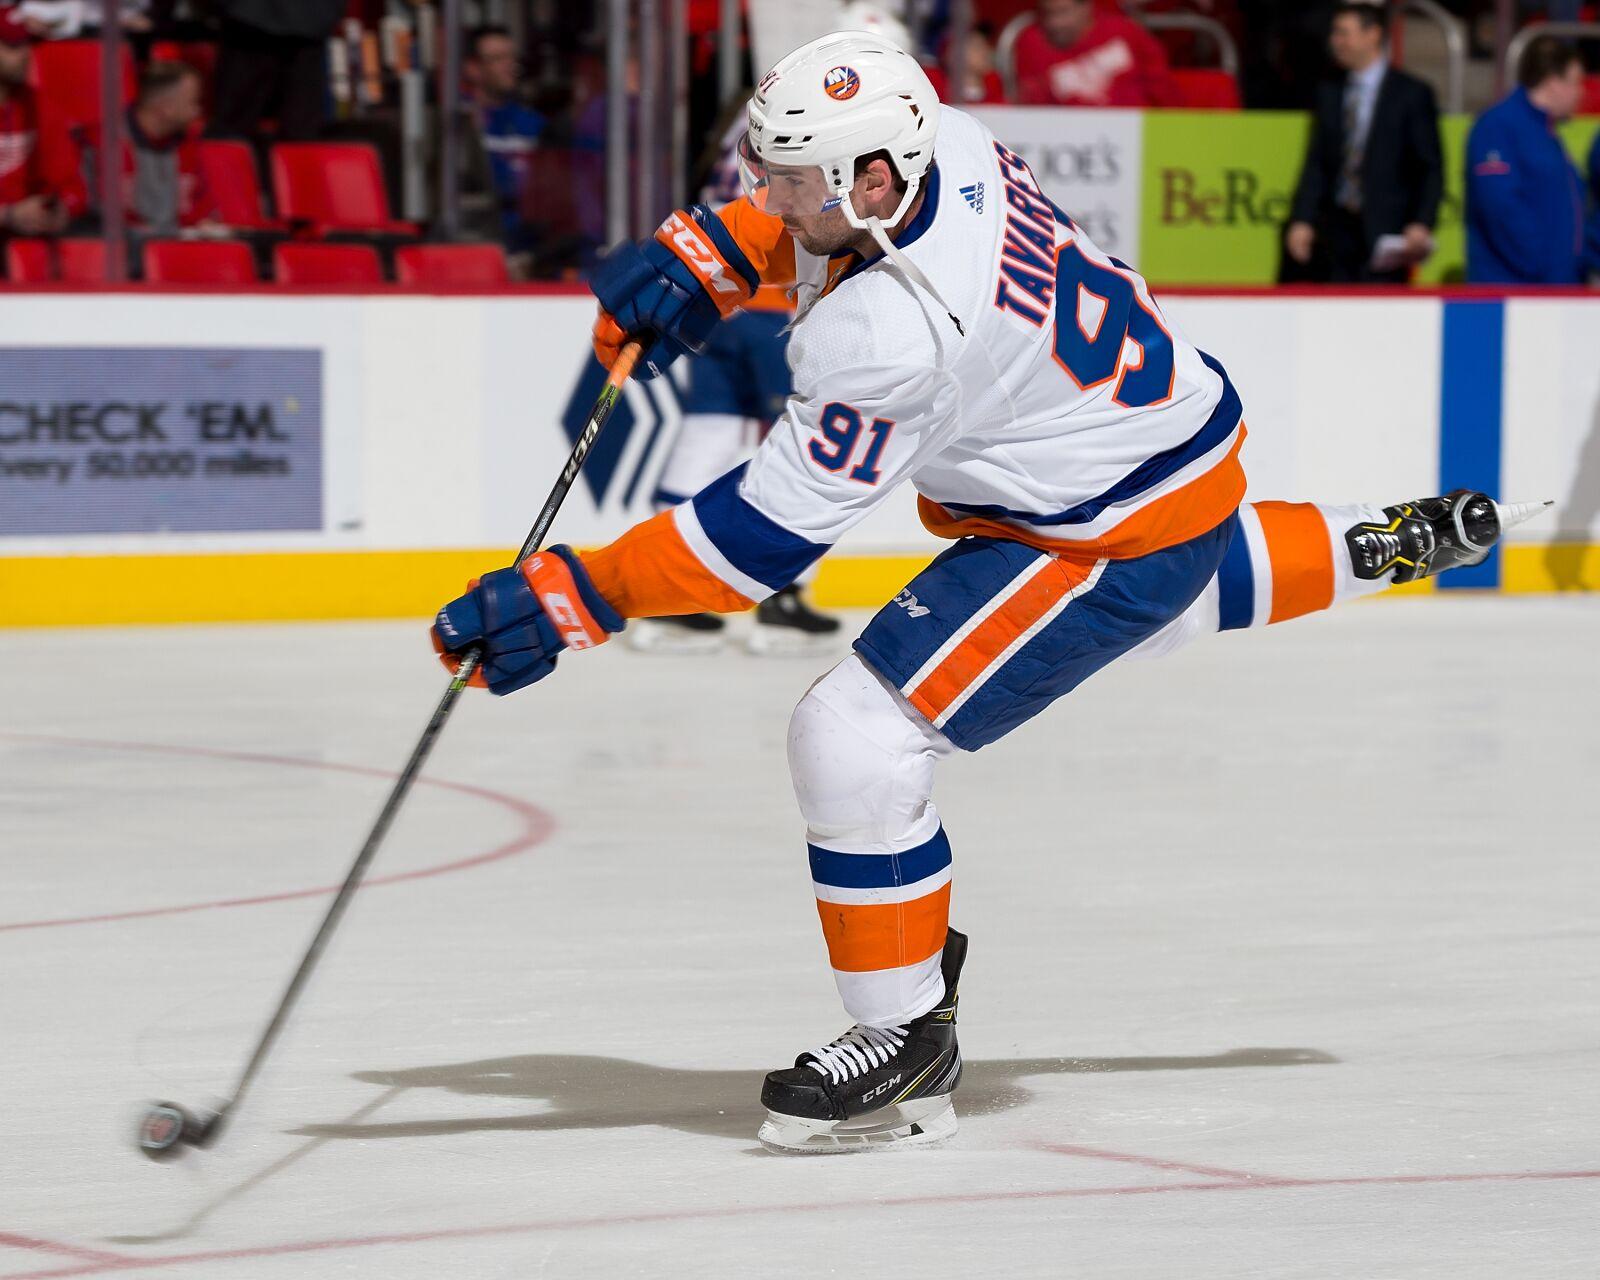 Toronto Maple Leafs: Betting on Tavares